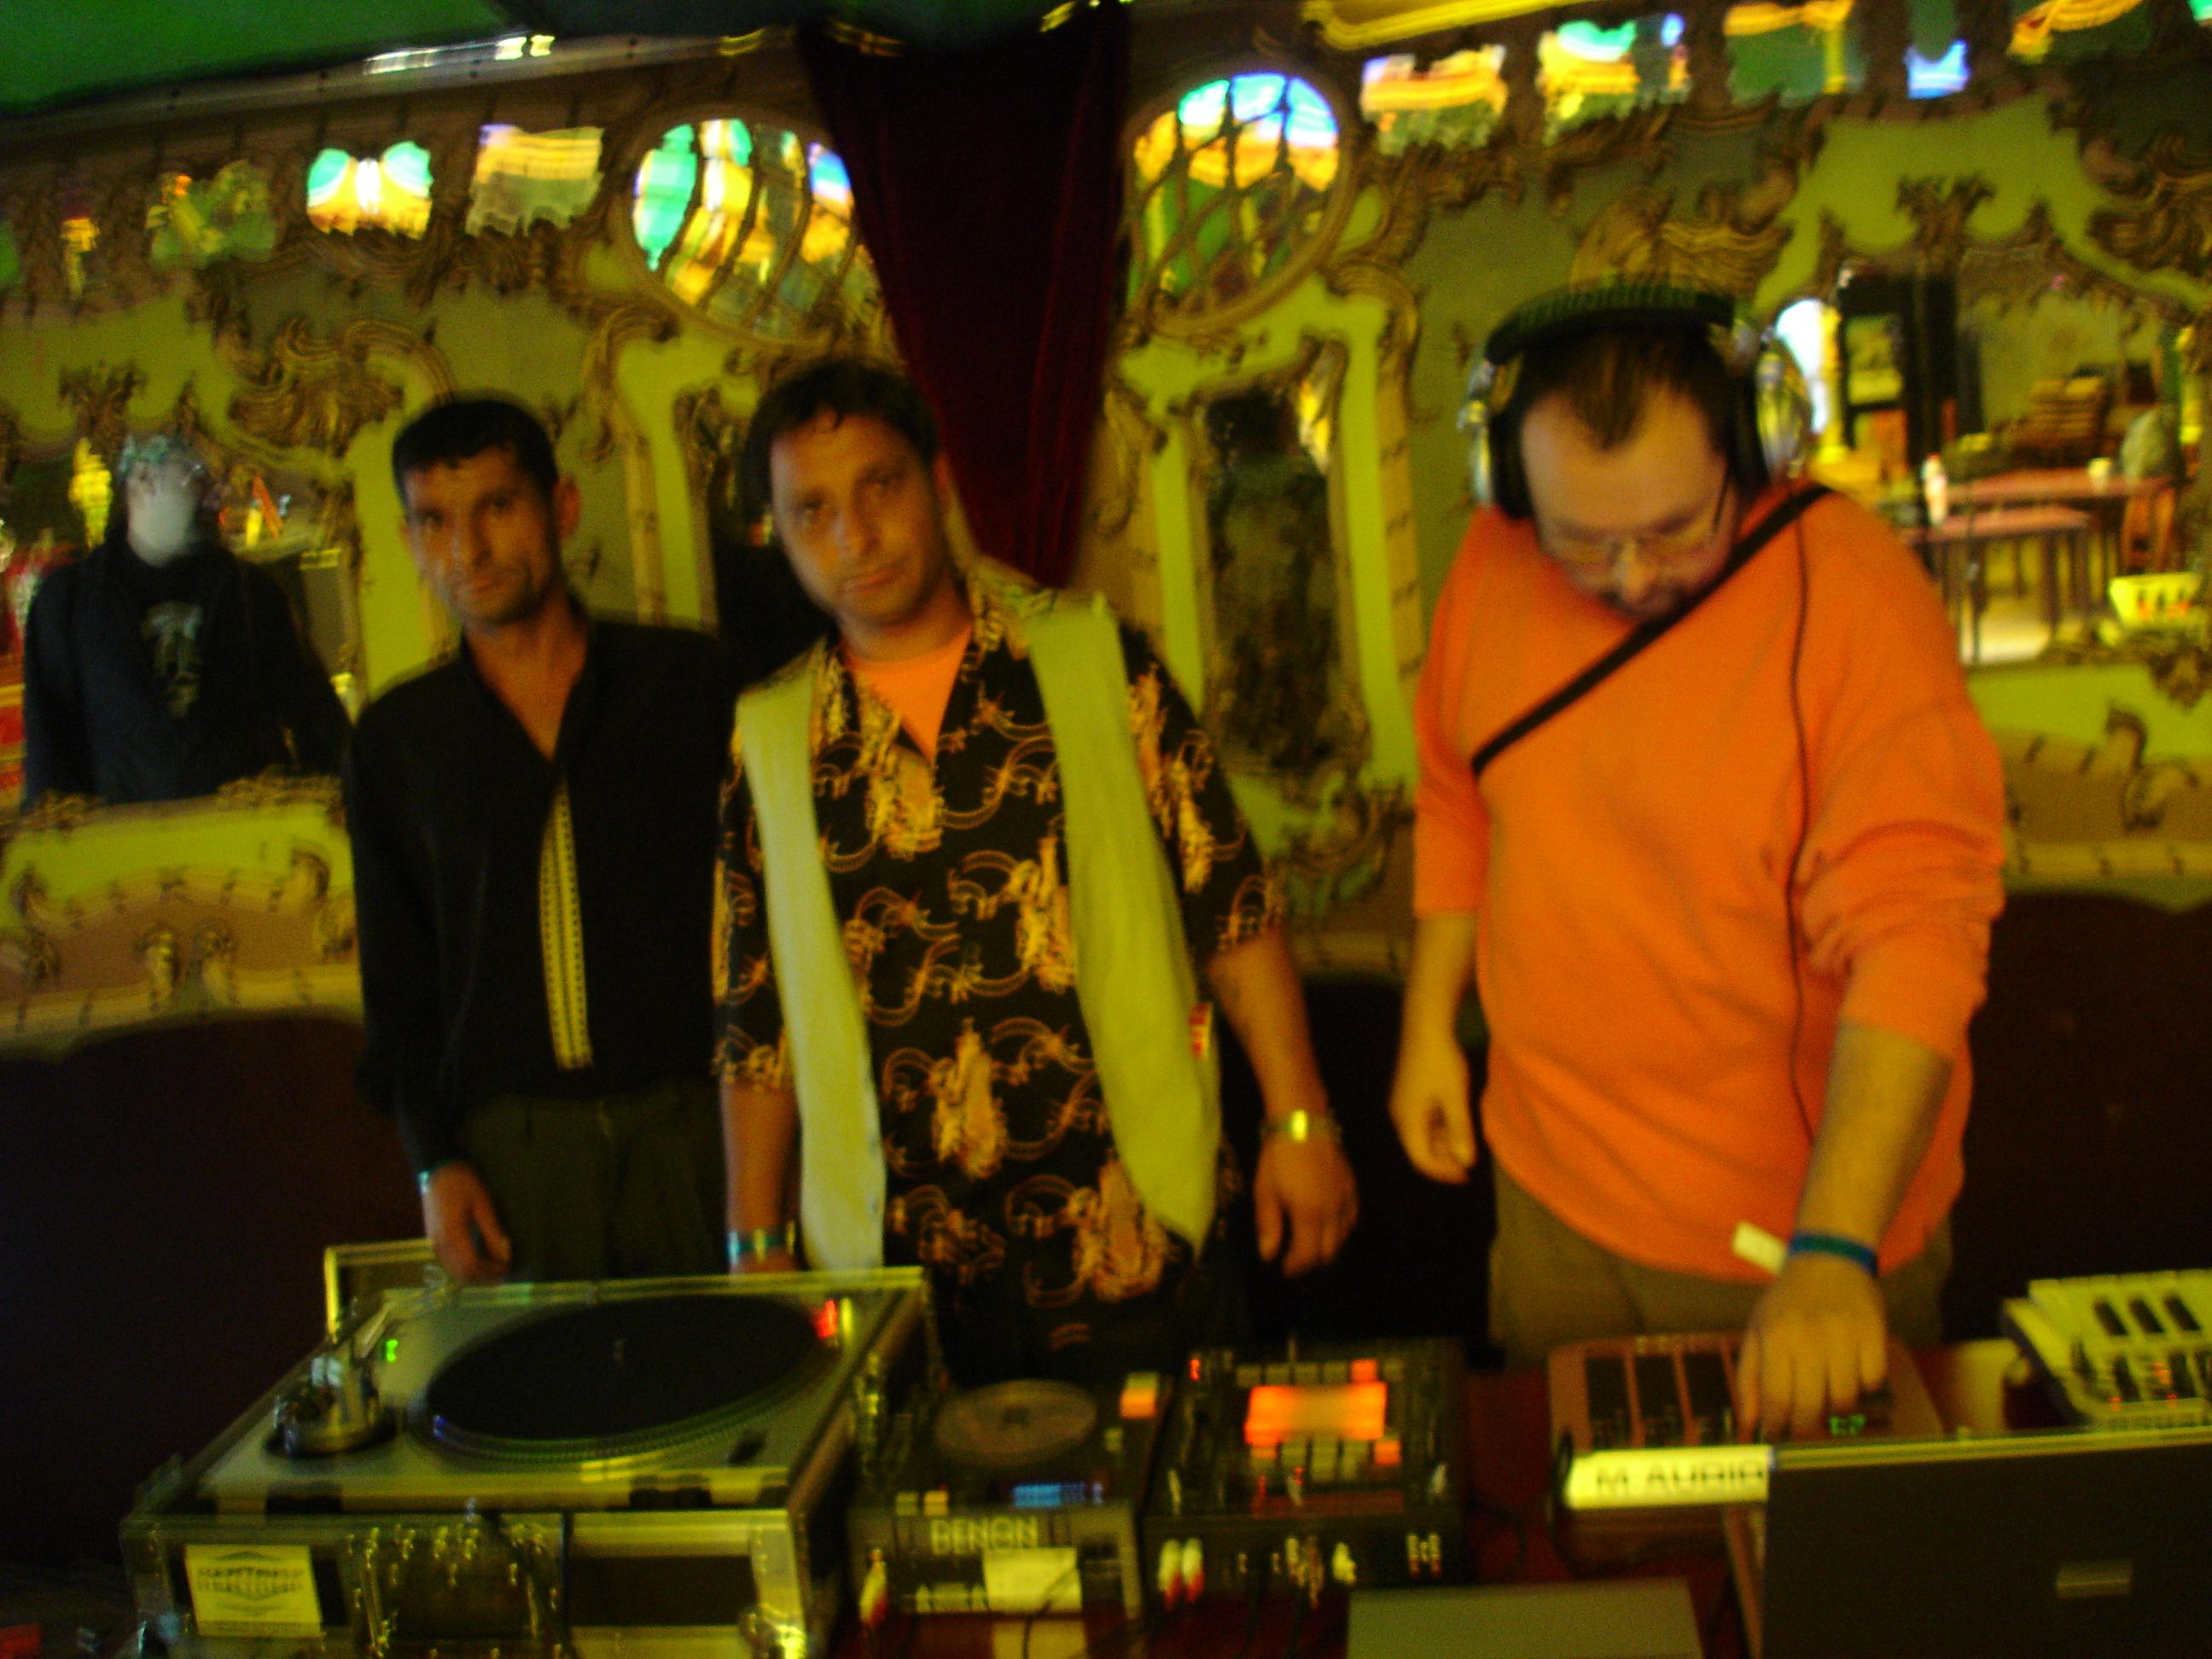 cu Napoleon si Clasic - Shukar Collective 2005 Groningen